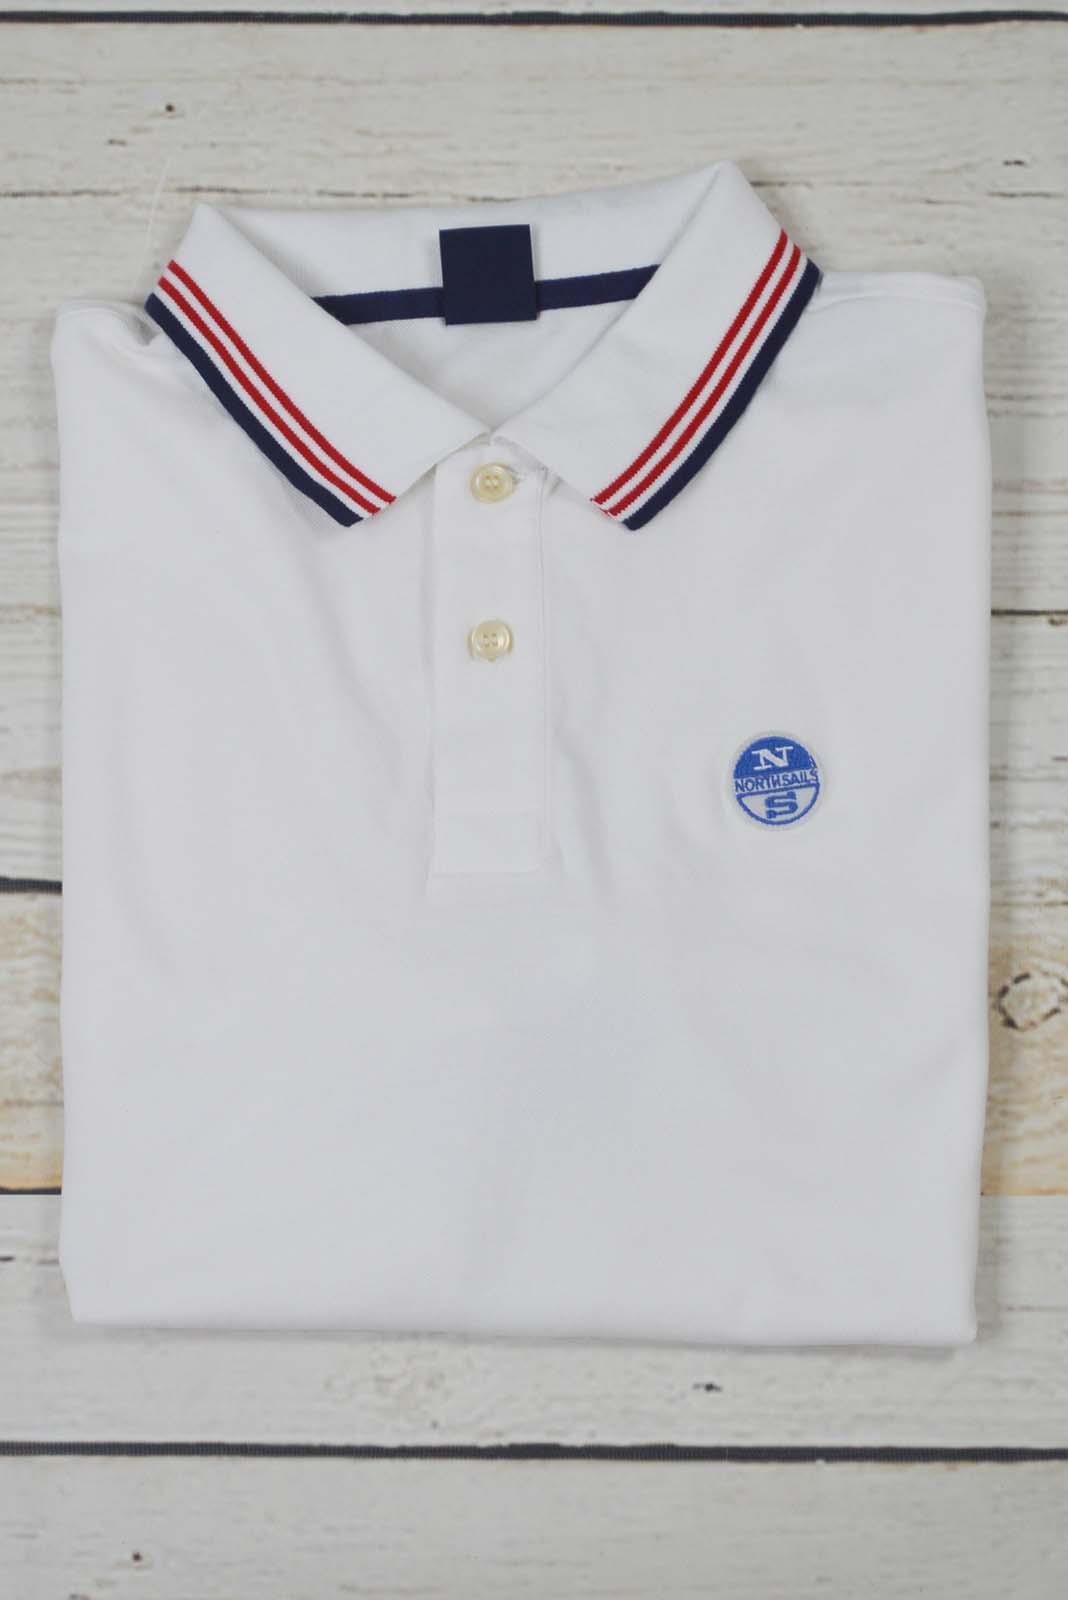 NORTH-SAILS-Mens-Legacy-Heritage-Short-Sleeve-Polo-Shirt-SALE-RRP-50 thumbnail 83